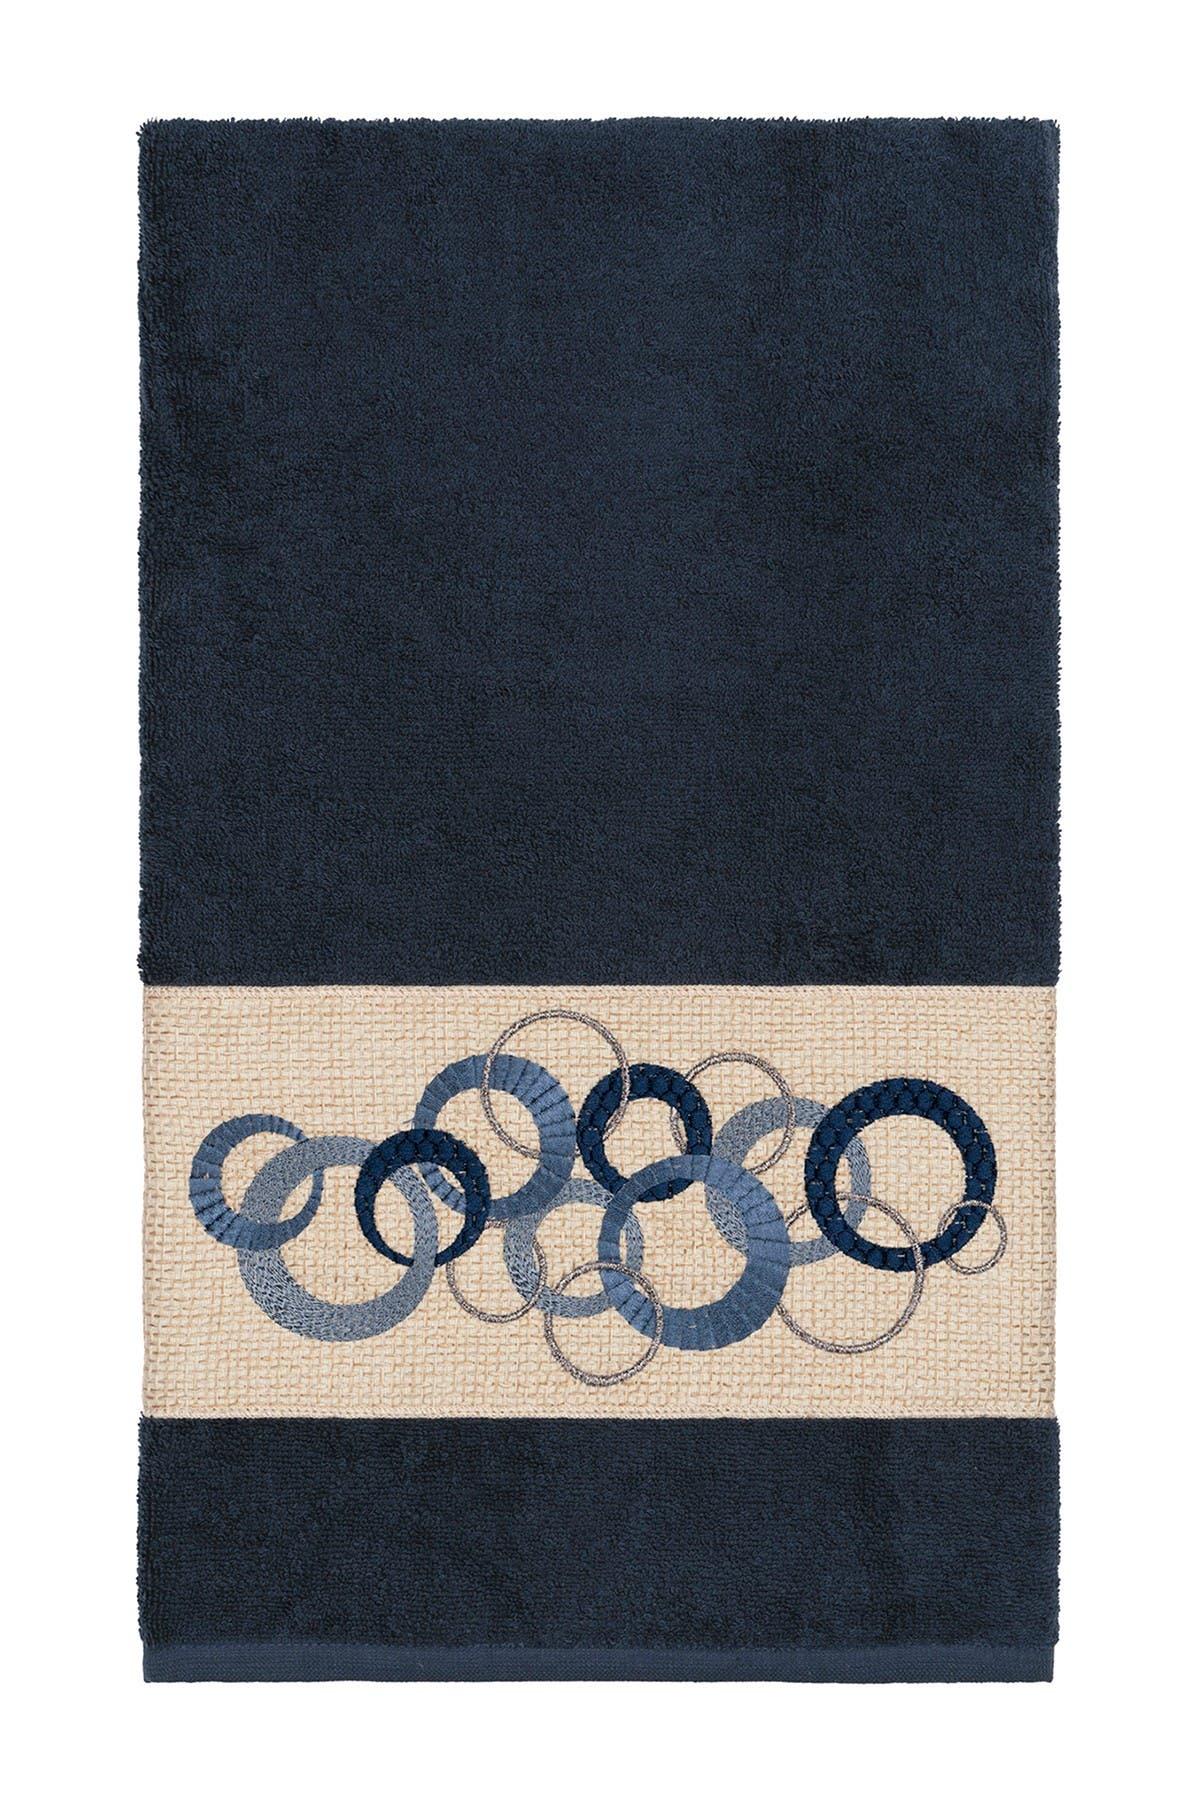 Image of LINUM HOME Annabelle Embellished Bath Towel - Midnight Blue